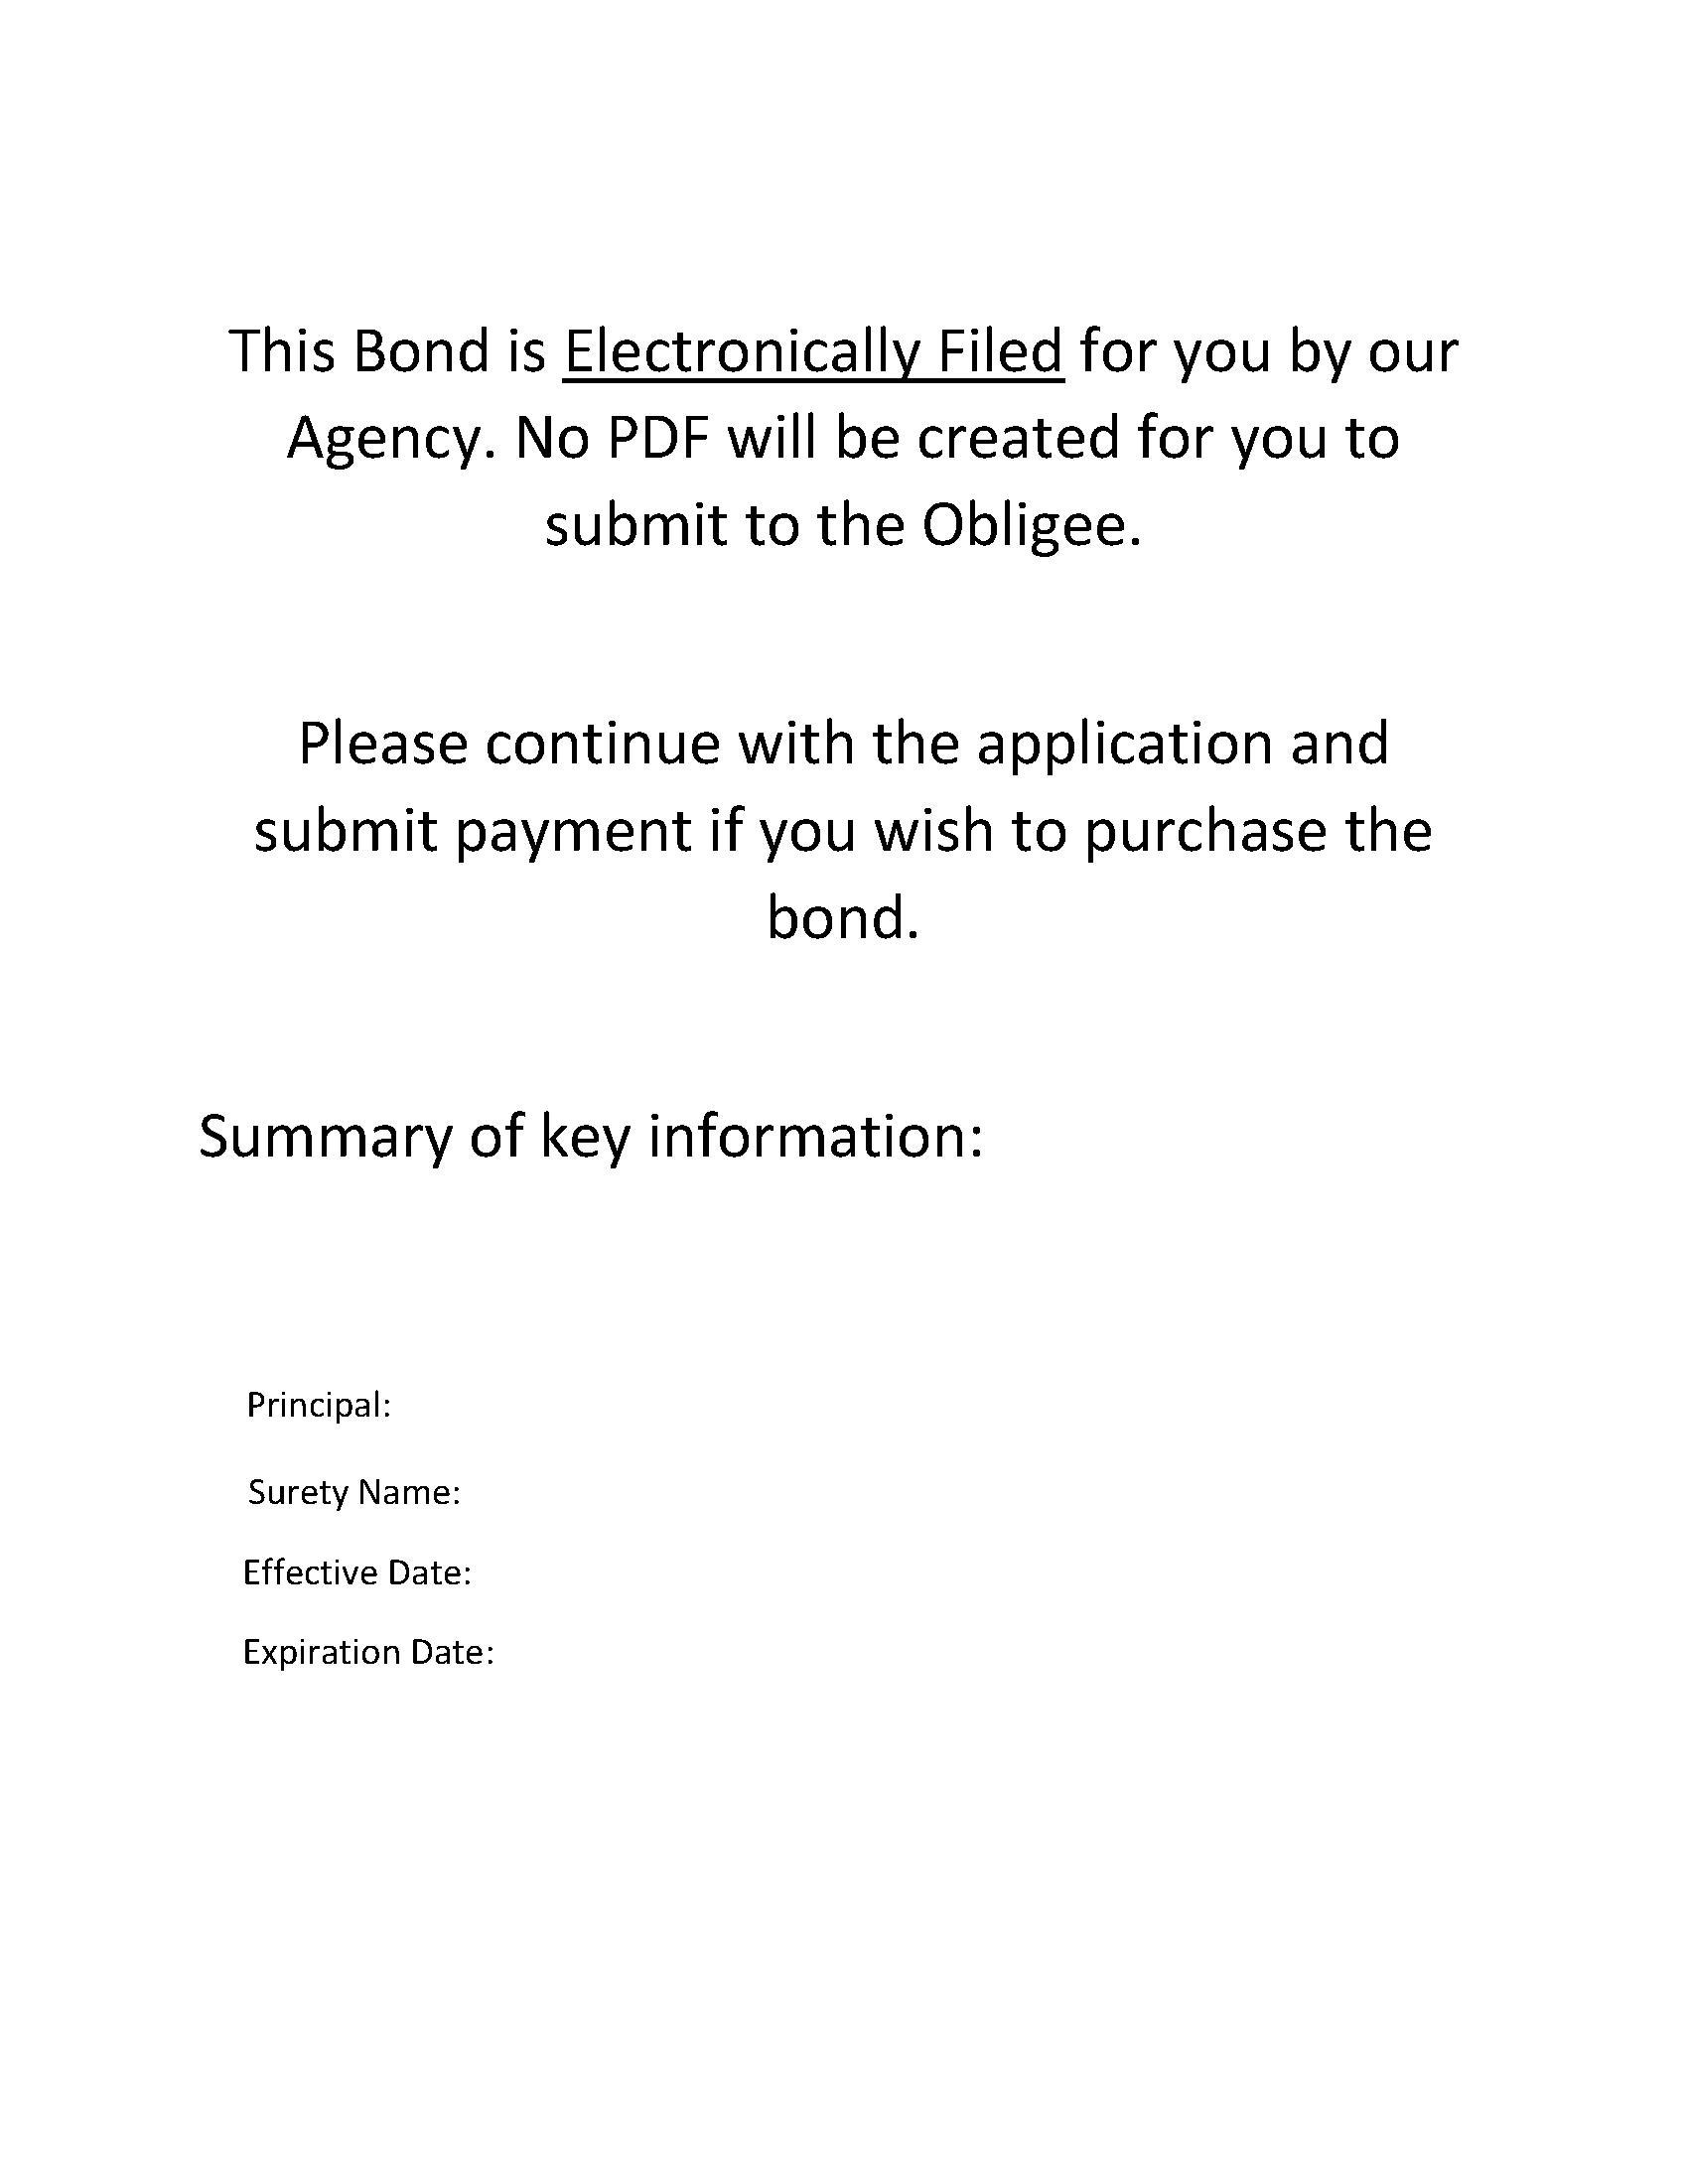 State of Georgia Mortgage Lender sample image